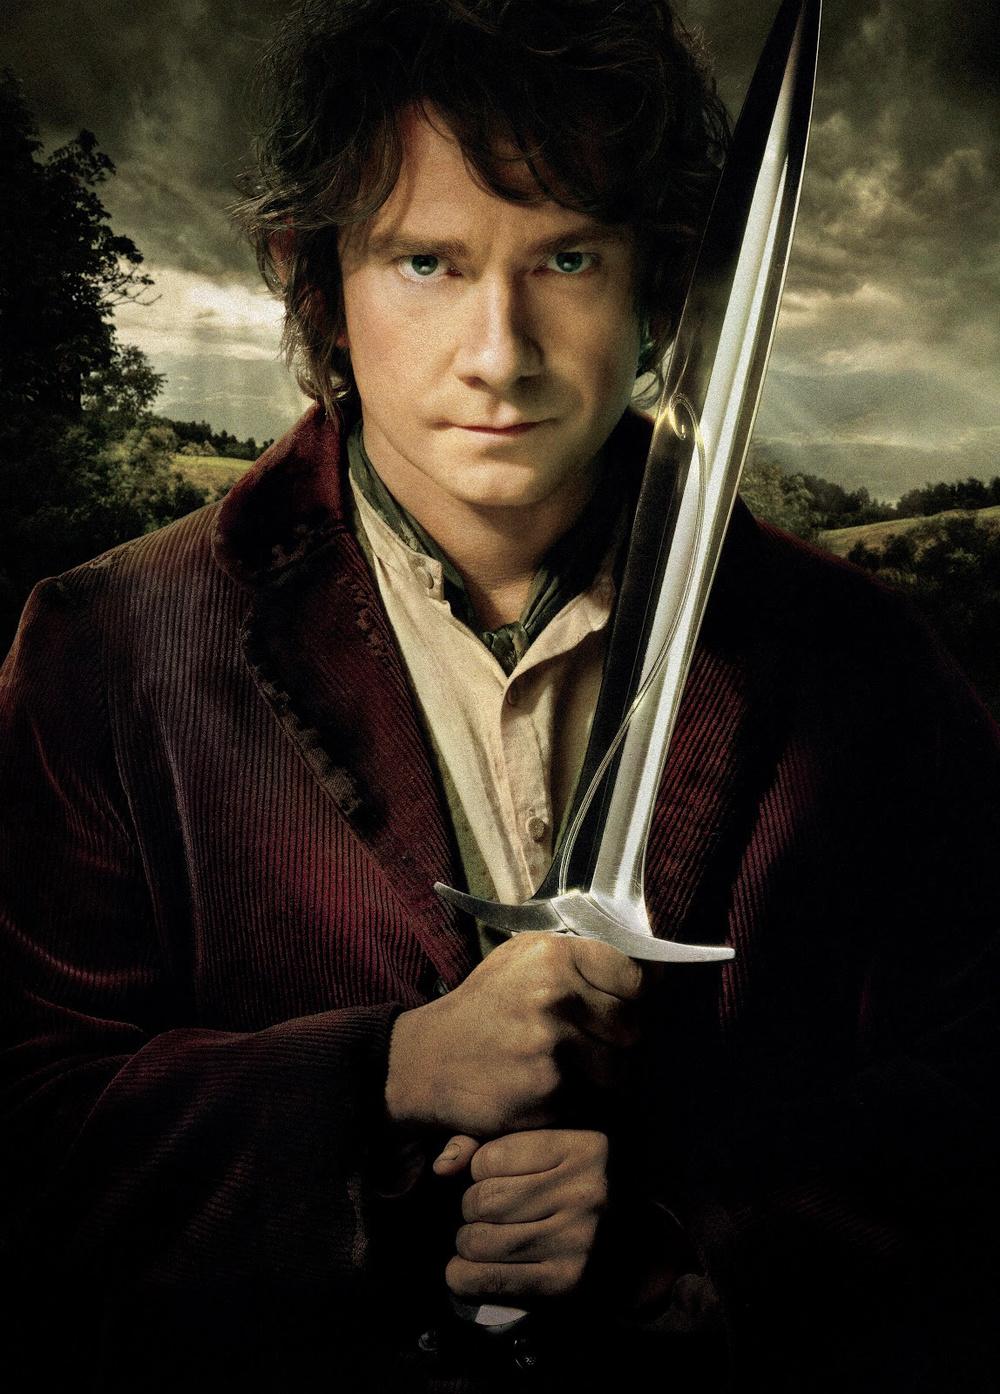 honest-trailer-for-the-hobbit-an-unexpected-journey.jpg